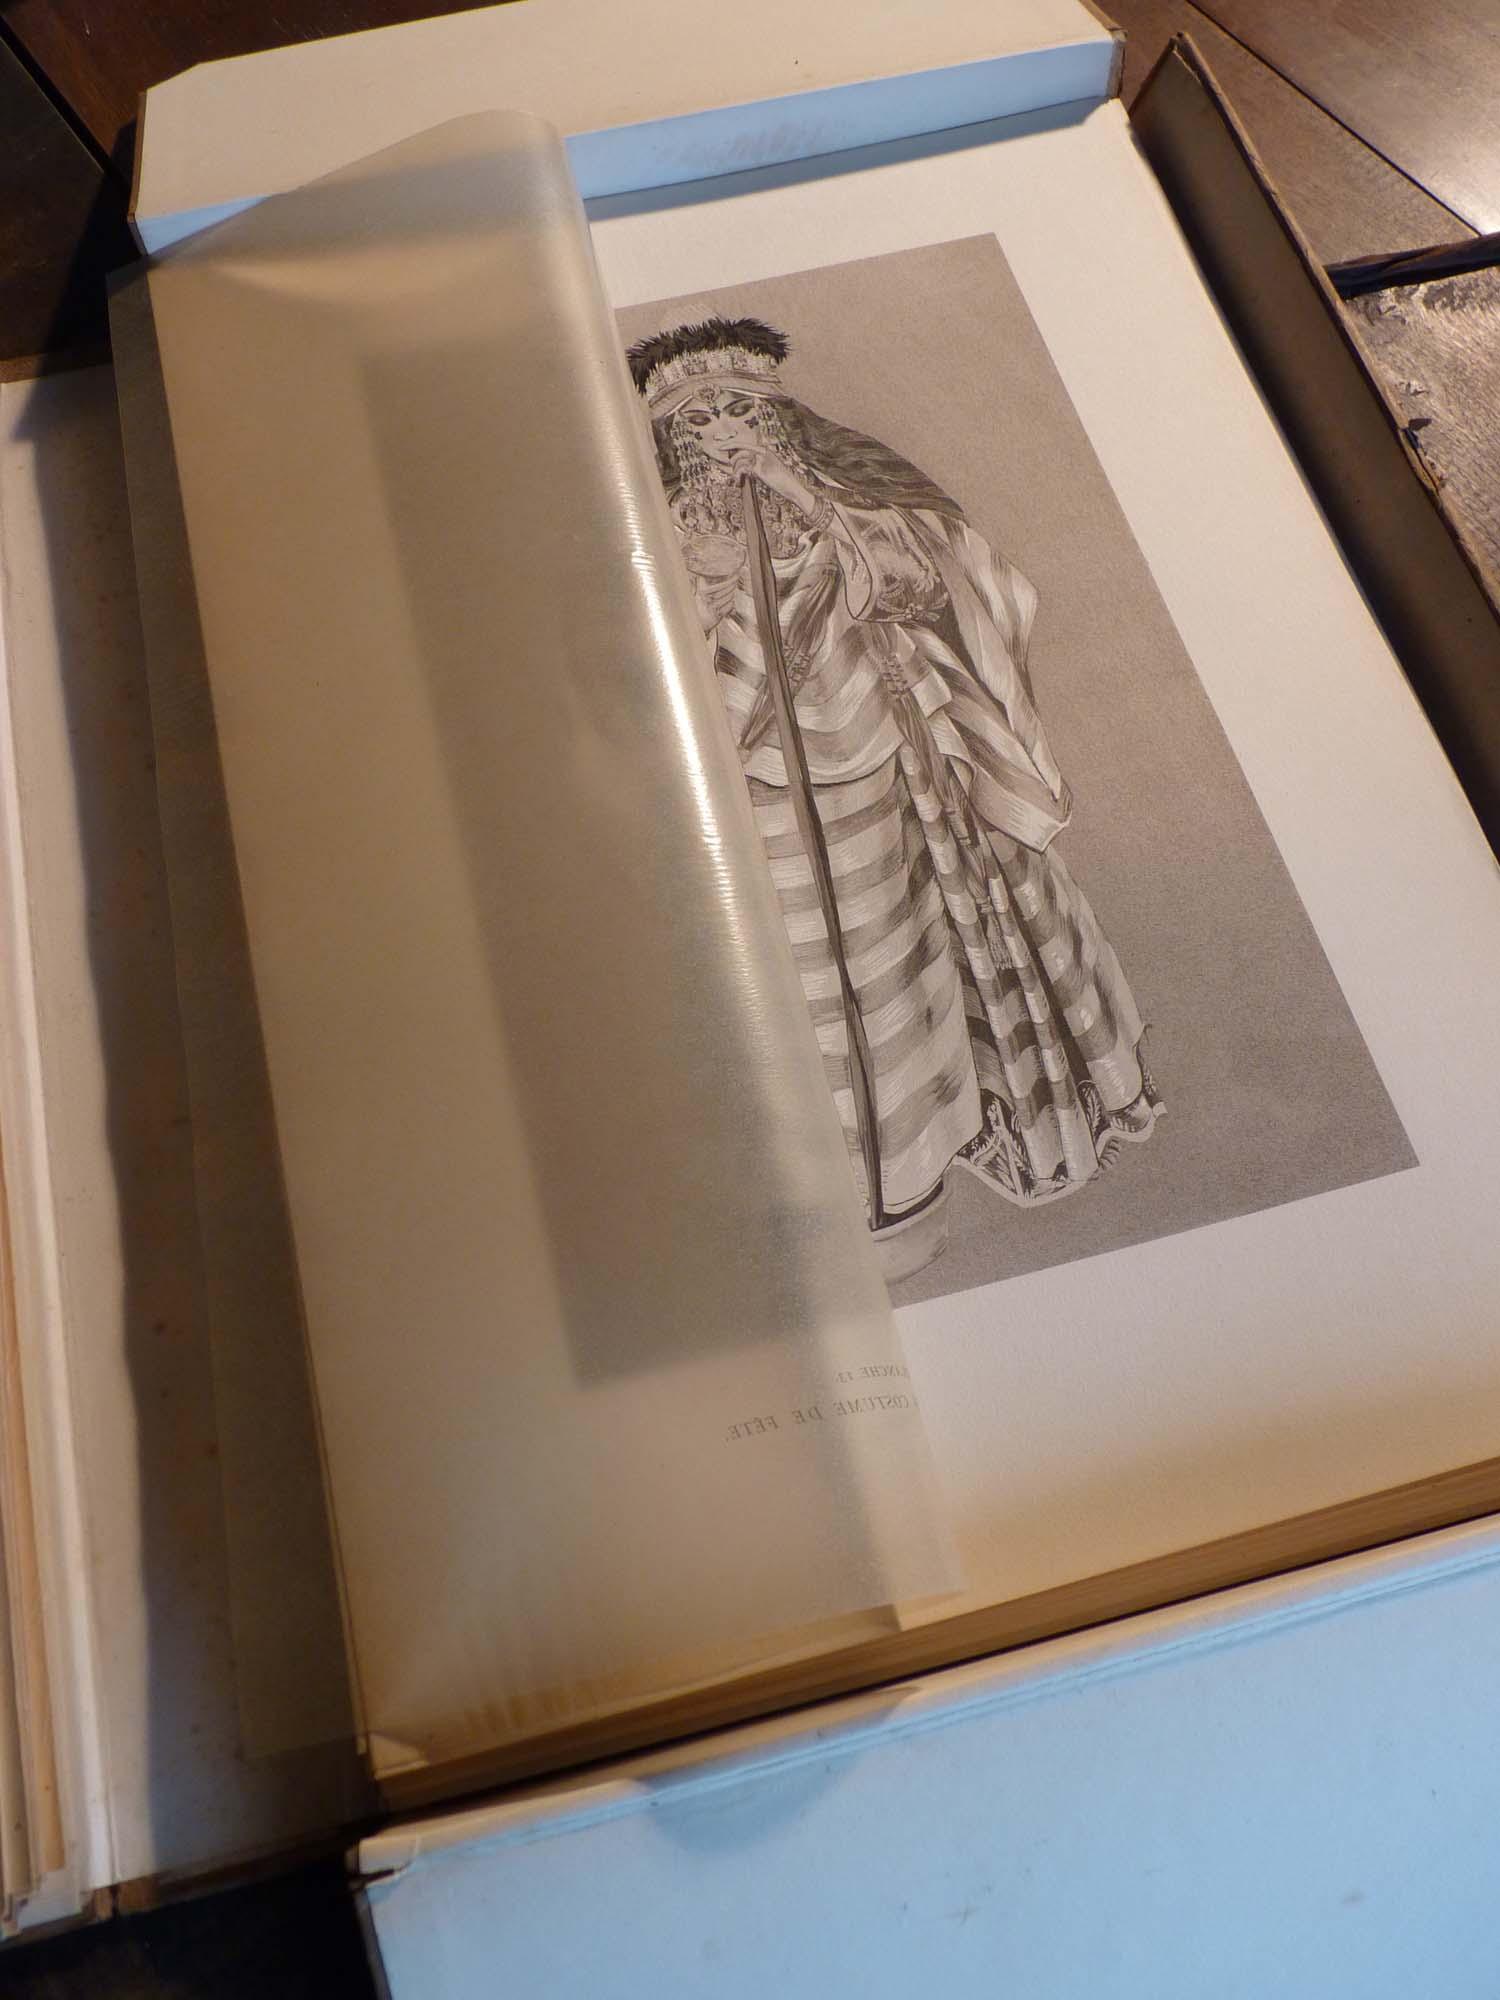 Types et Costumes du Maroc Besancenot-Girard